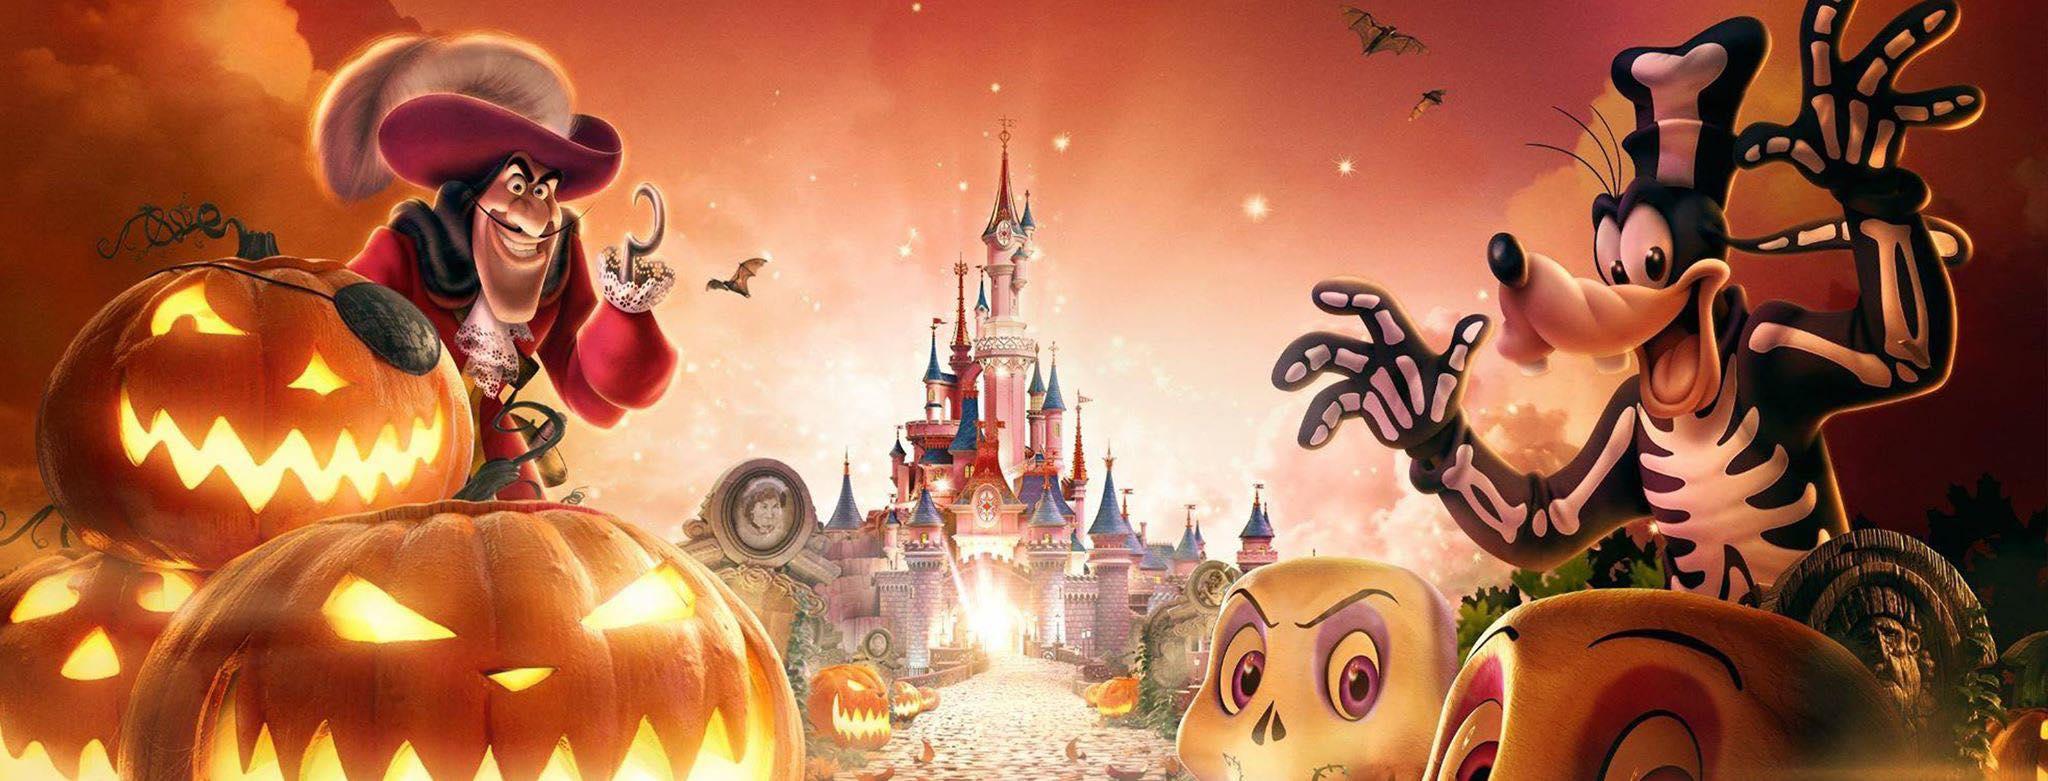 Saison Halloween Disneyland Paris 2020 Disneyland Paris – Octobre 2020 – Halloween – Funny Tours Voyages